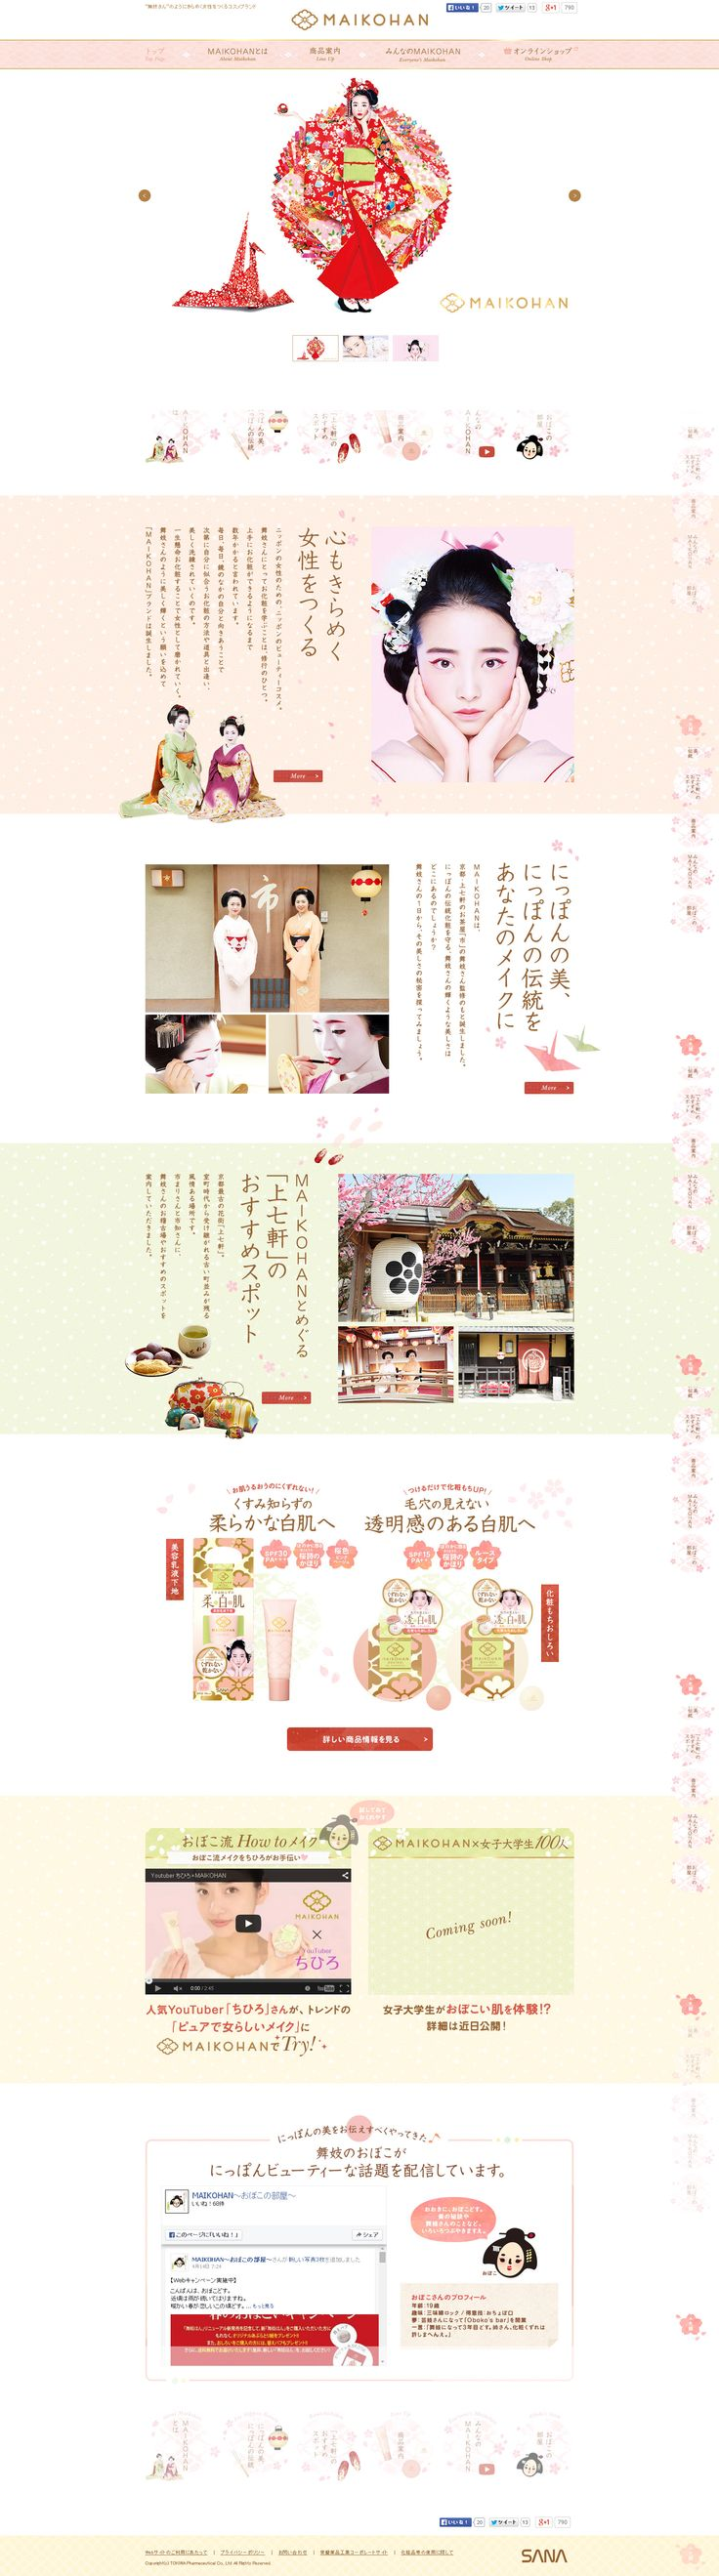 http://www.sana.jp/maikohan/